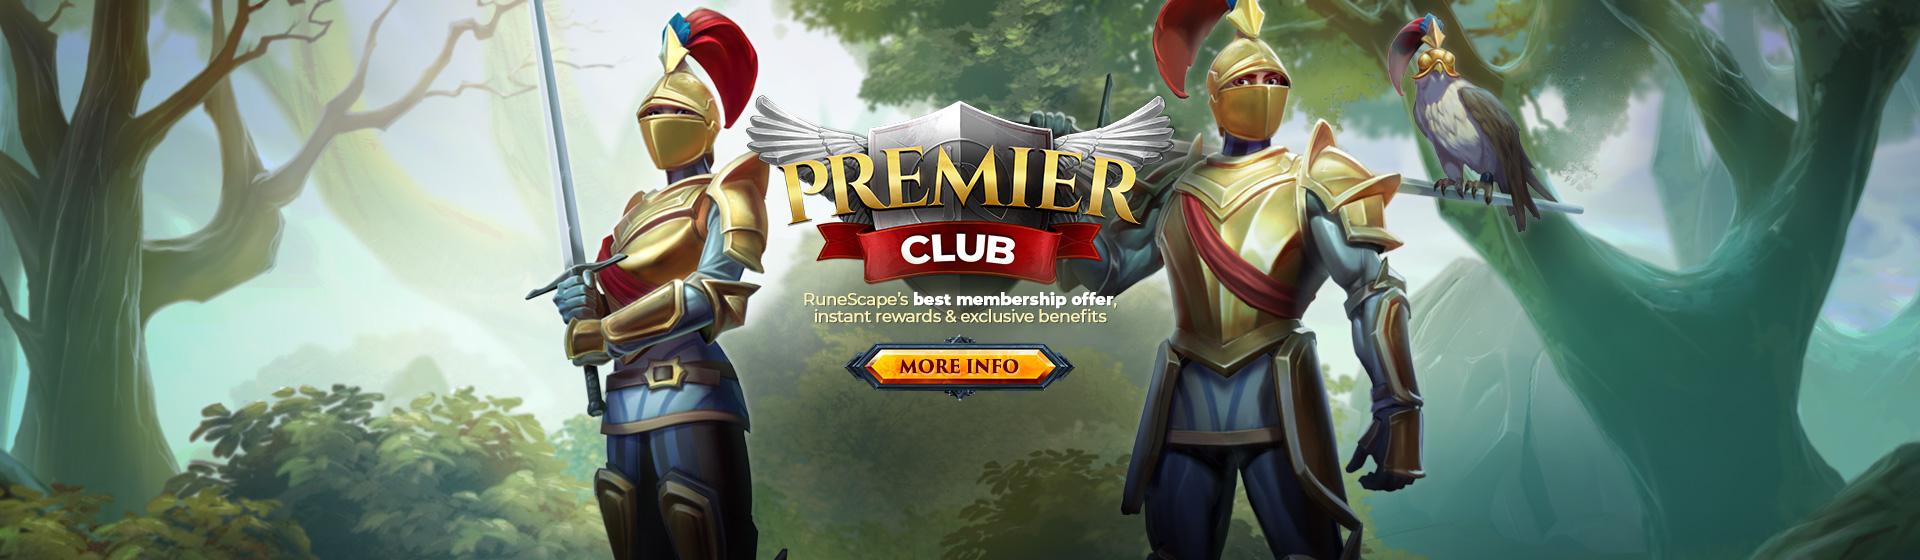 Premier Club 2020